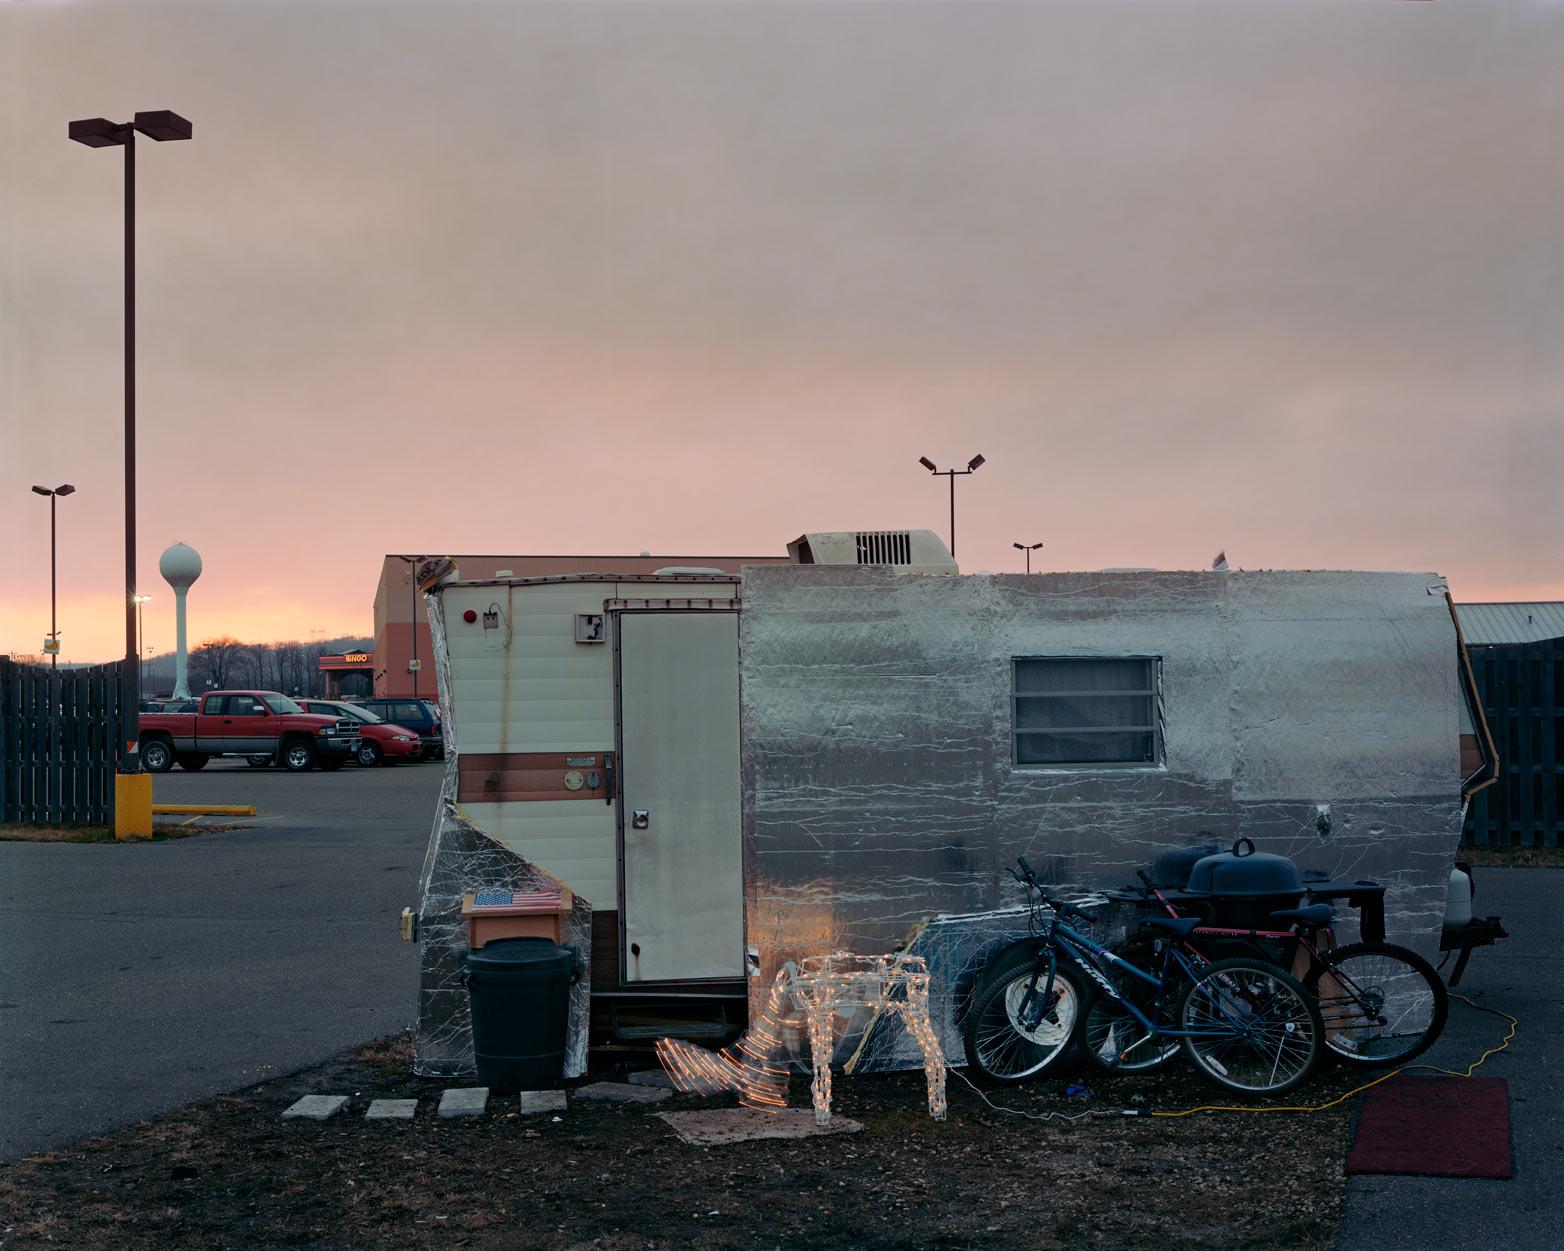 Home, Treasure Island Casino, Red Wing, MN, 2002